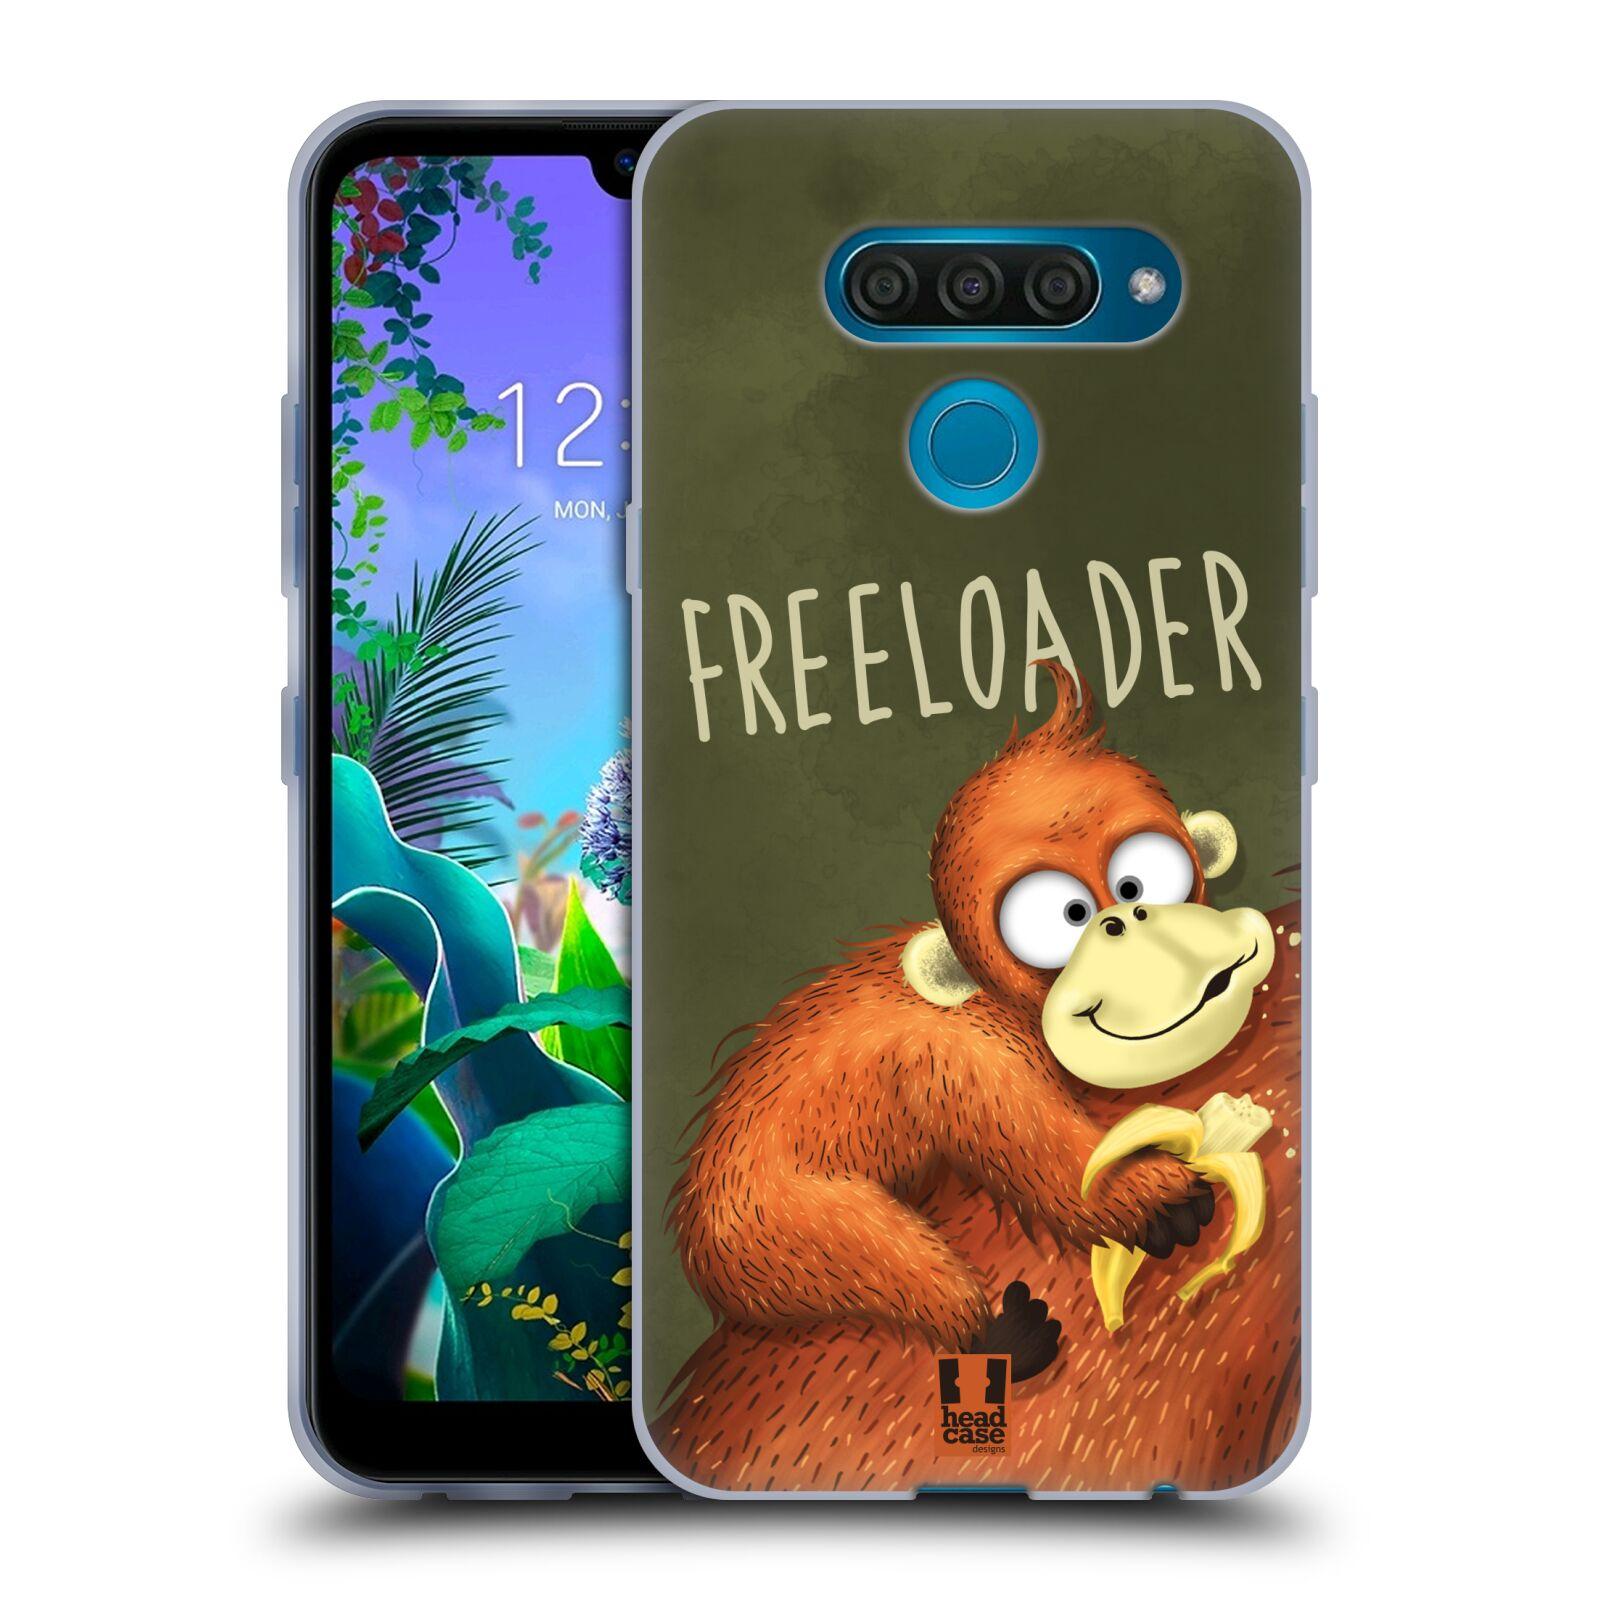 Silikonové pouzdro na mobil LG Q60 - Head Case - Opičák Freeloader